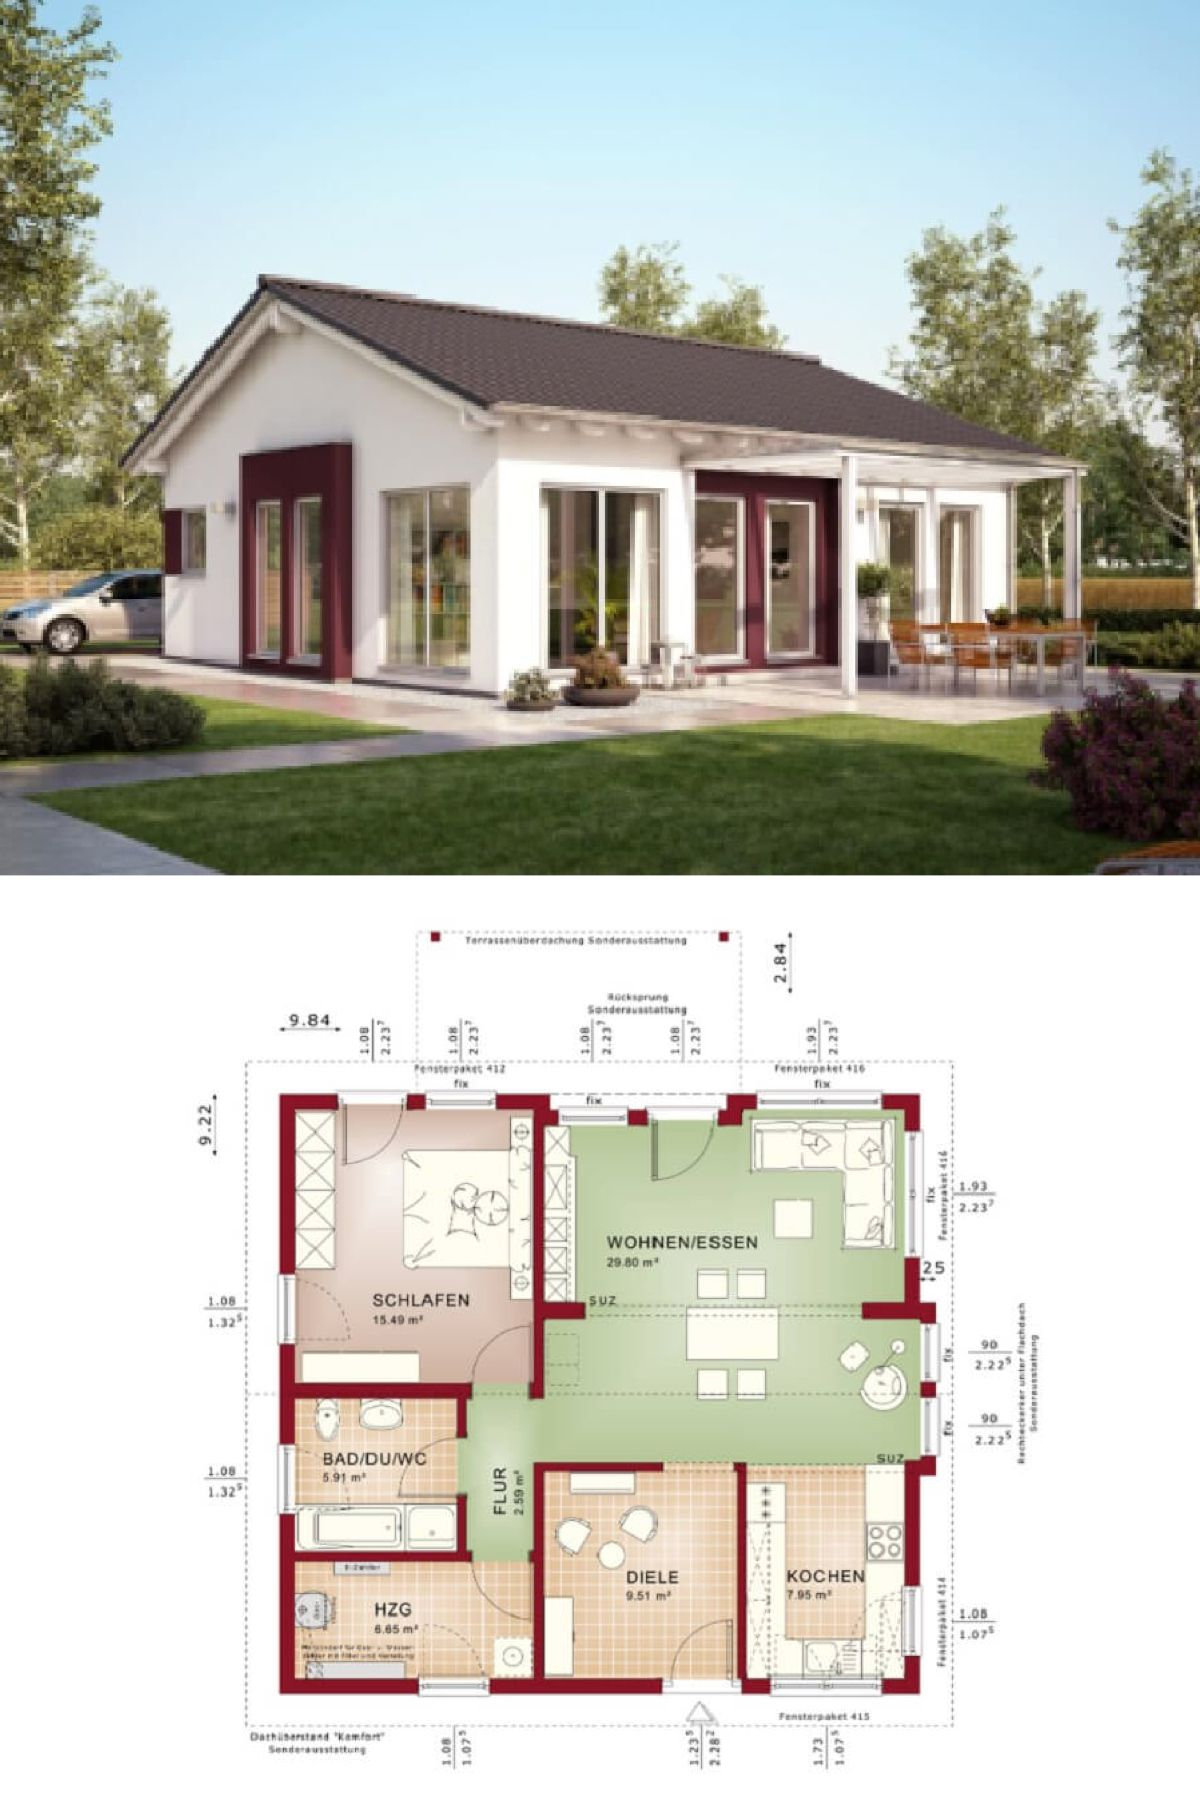 Moderner Bungalow mit Satteldach - Haus Solution 078 V6 Living Haus ...